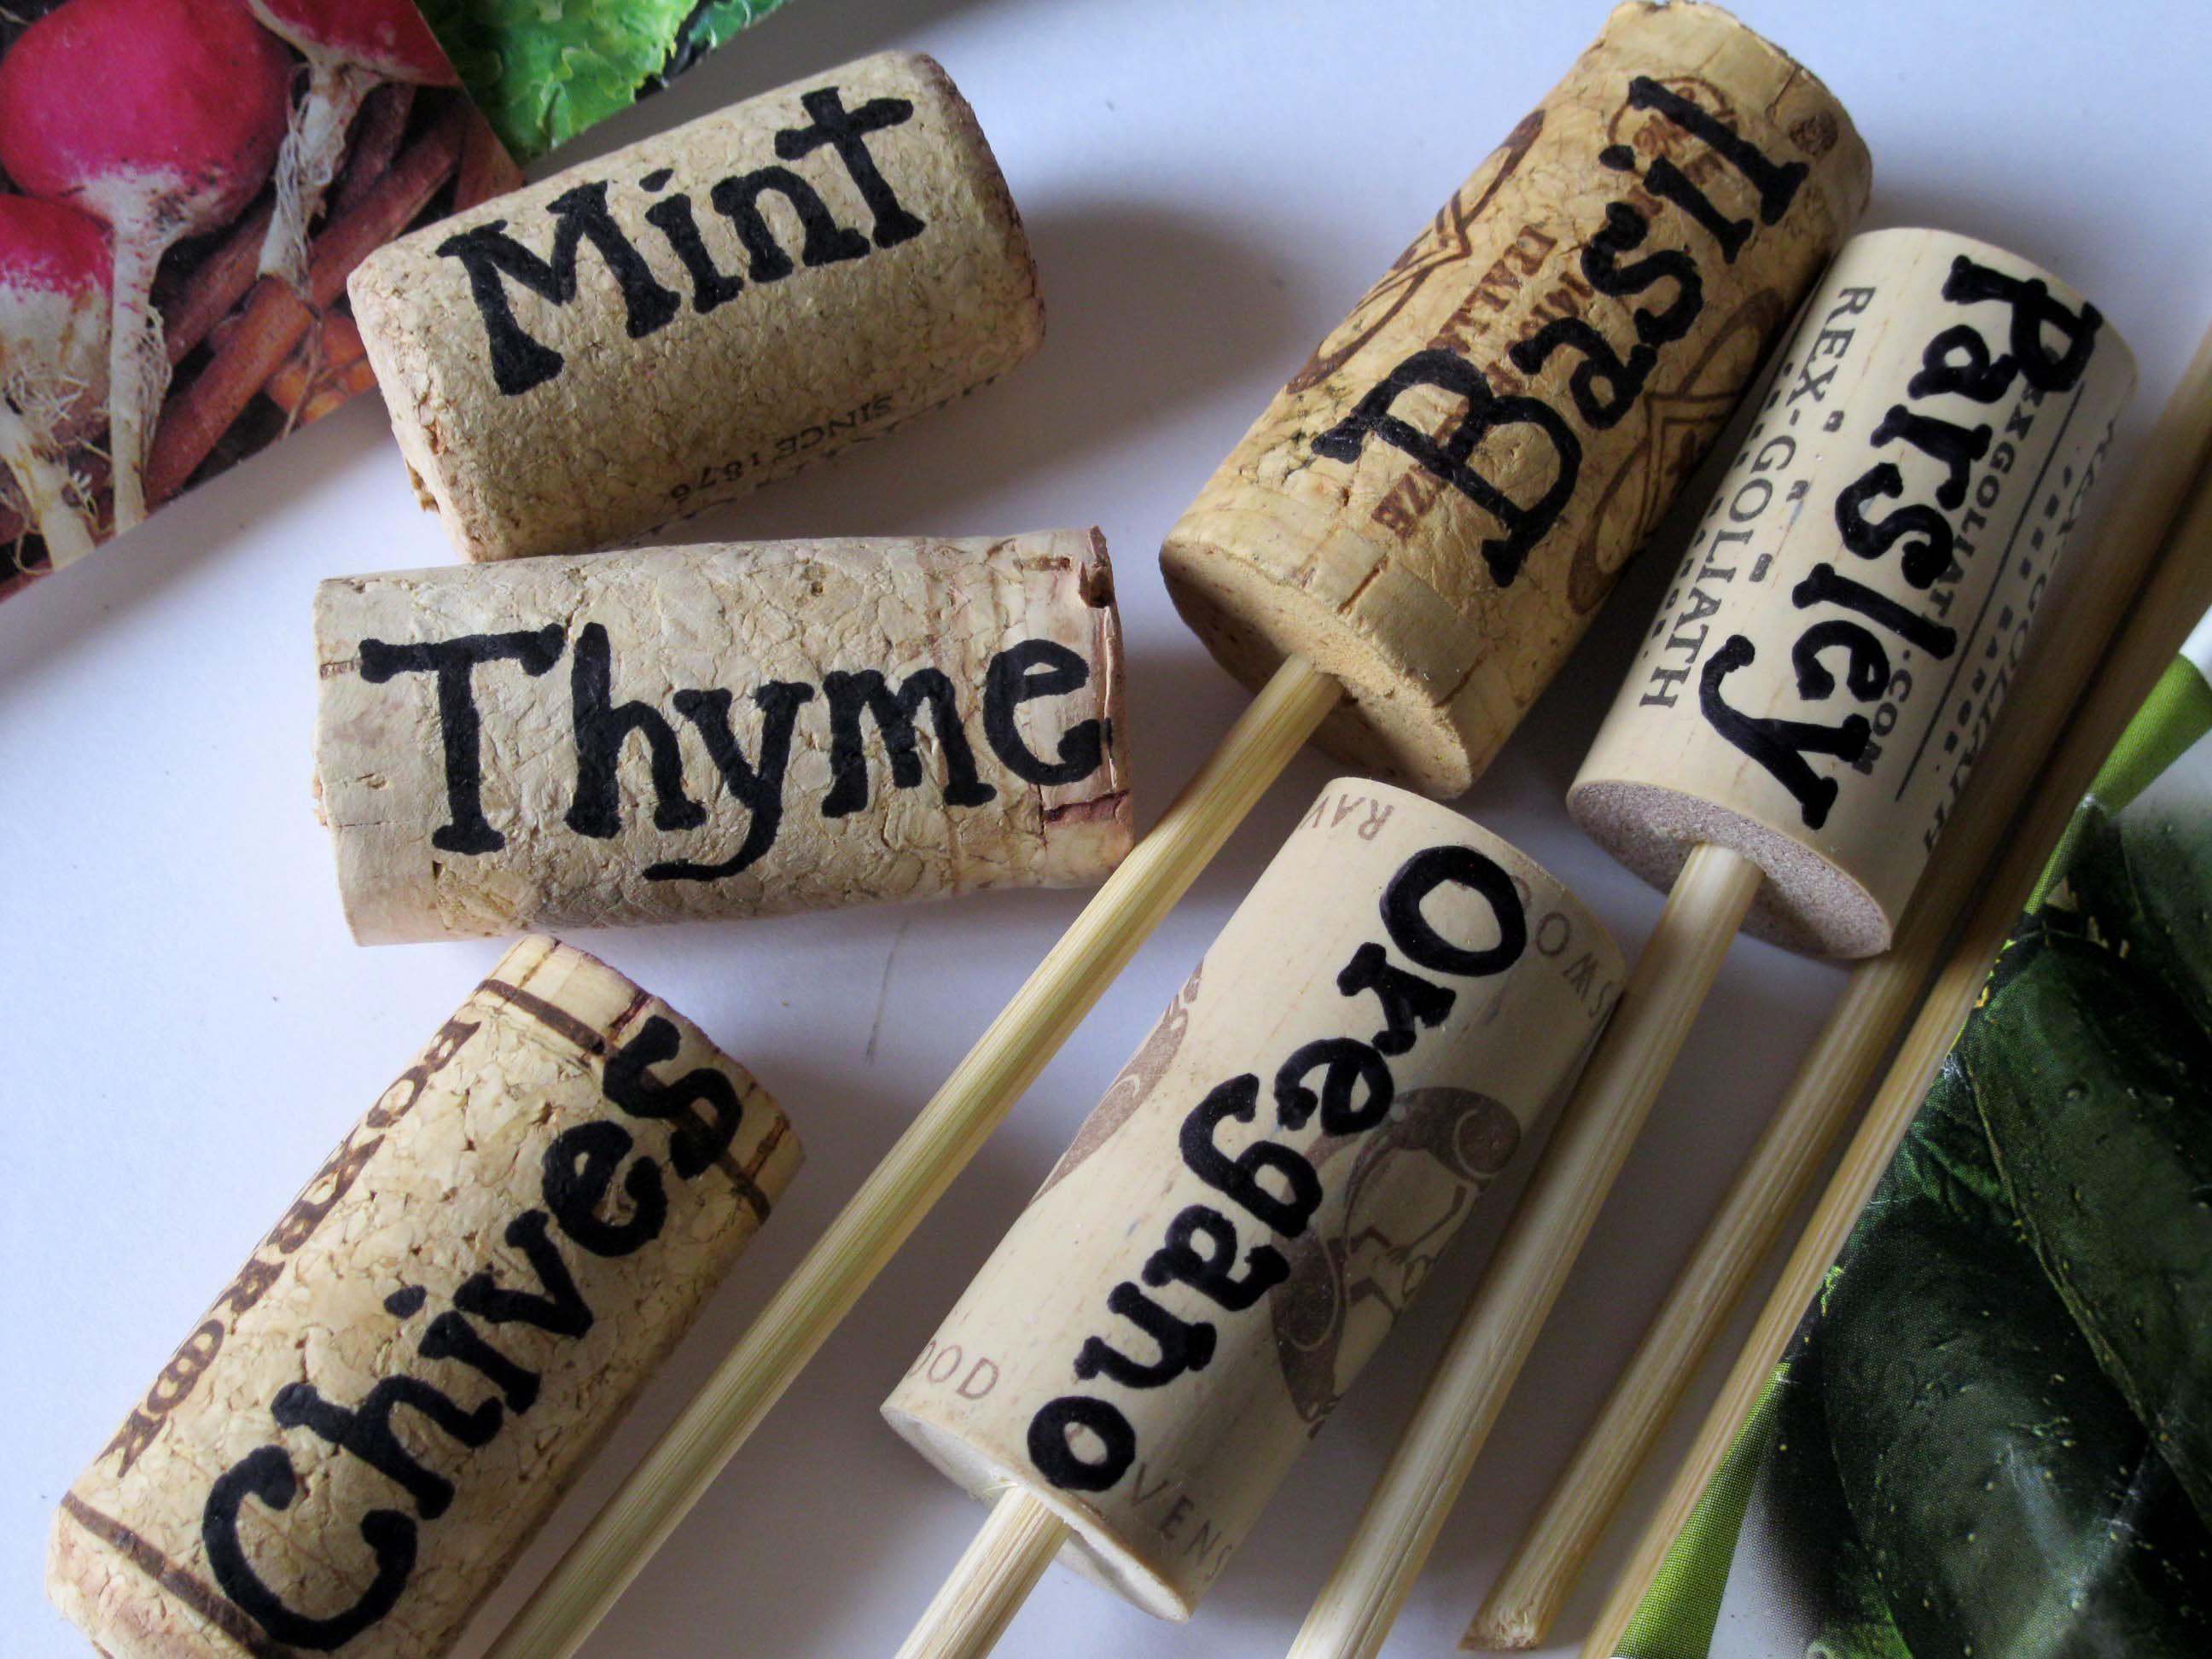 Diy garden markers made from wine corks gardens for Garden design ideas cork